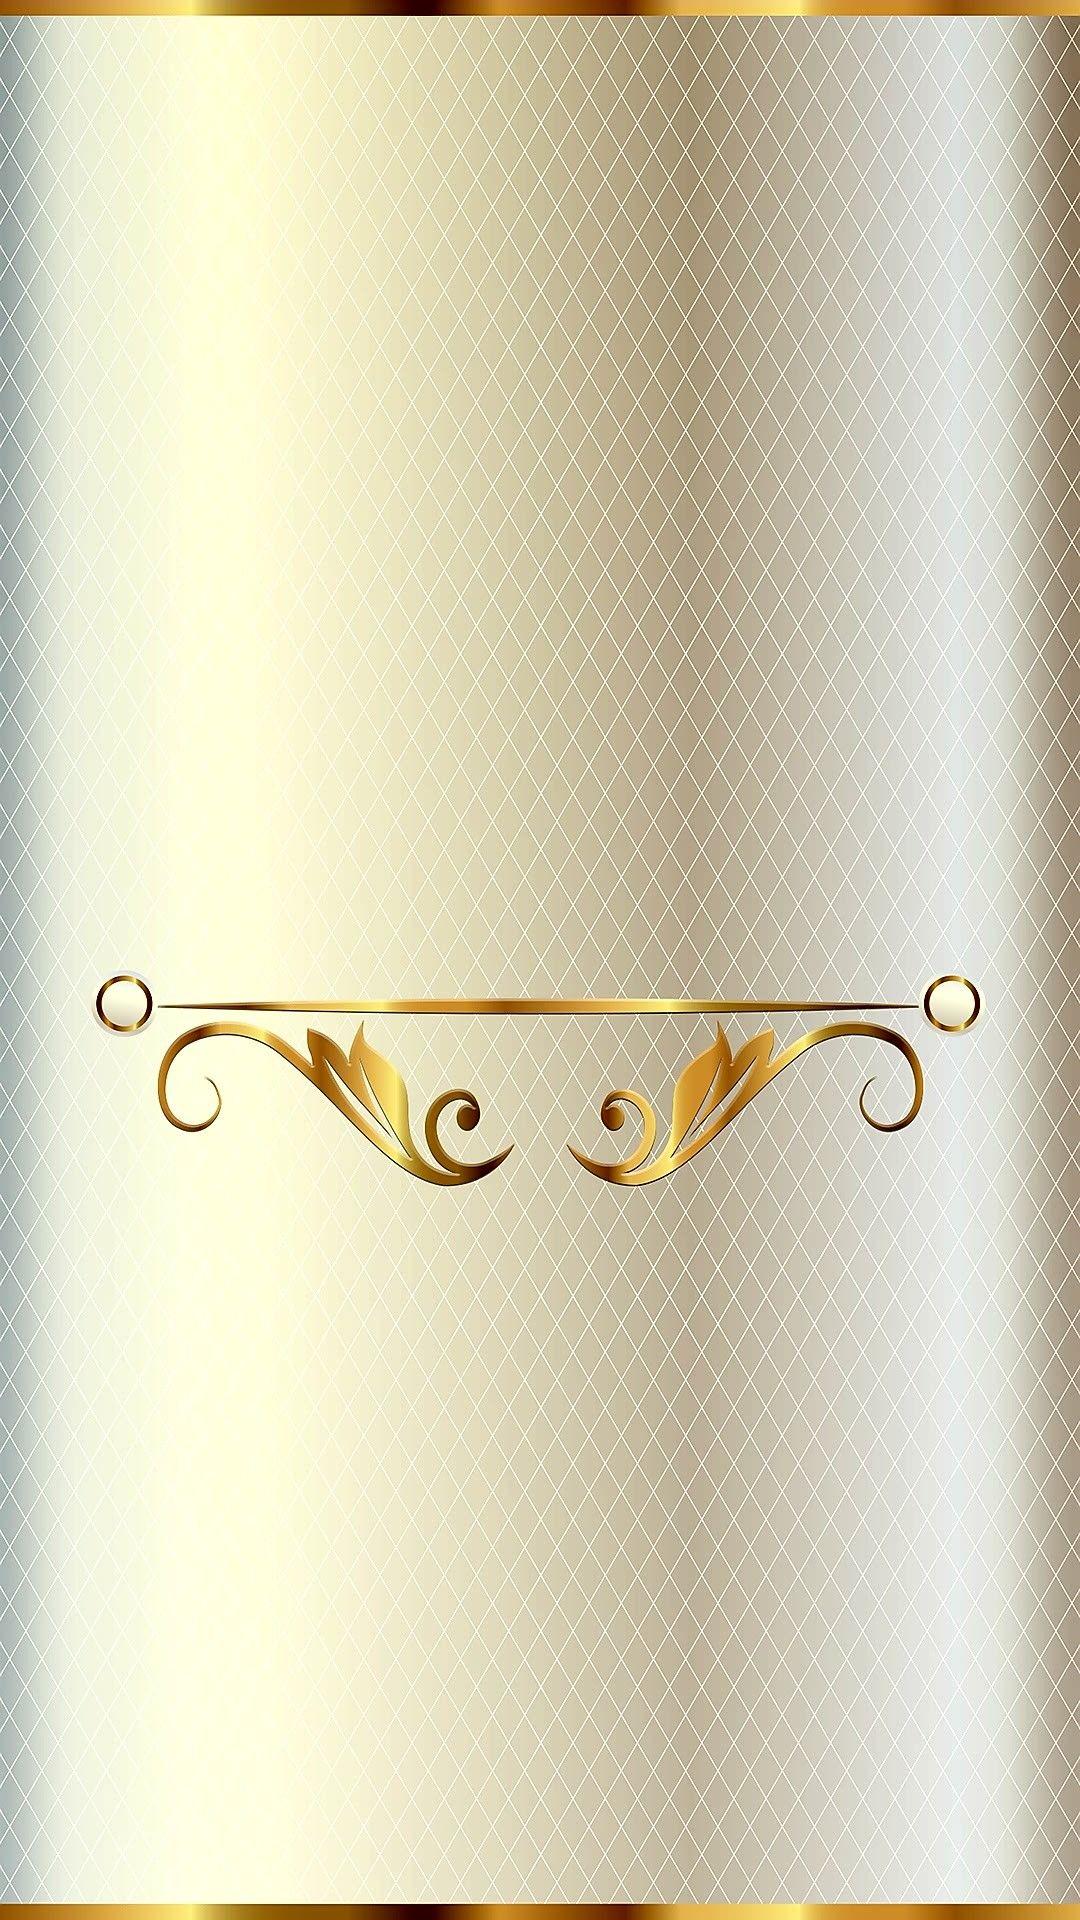 Gold and white ivory cream วอลเปเปอร์, กรอบรูป, พื้นหลัง